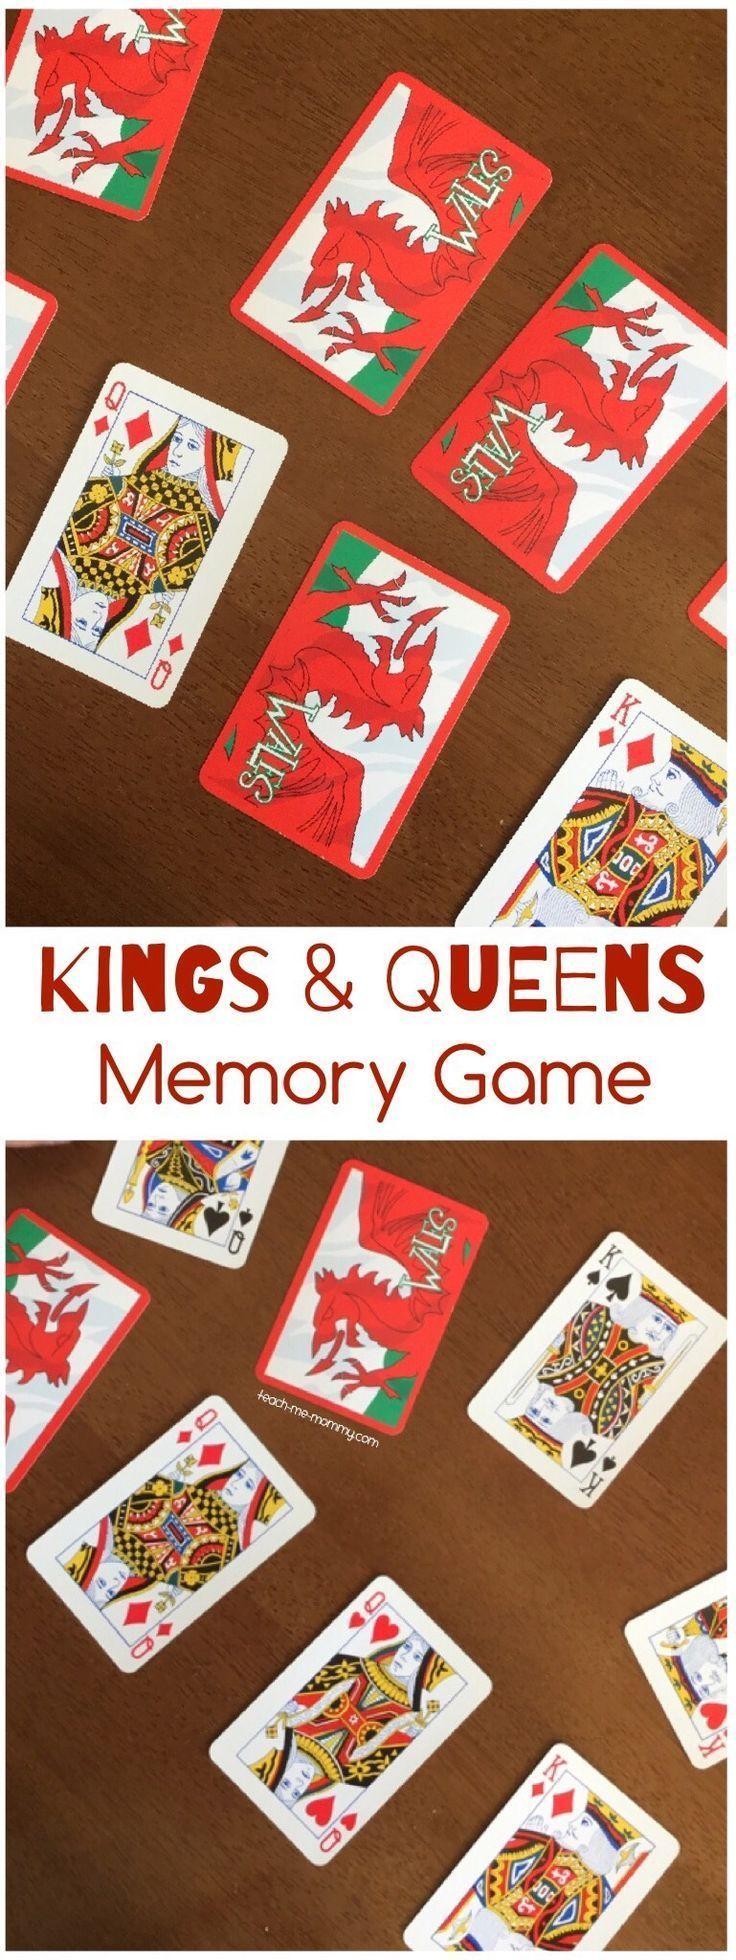 Kings & Queens Memory Game Memory games, Queens card